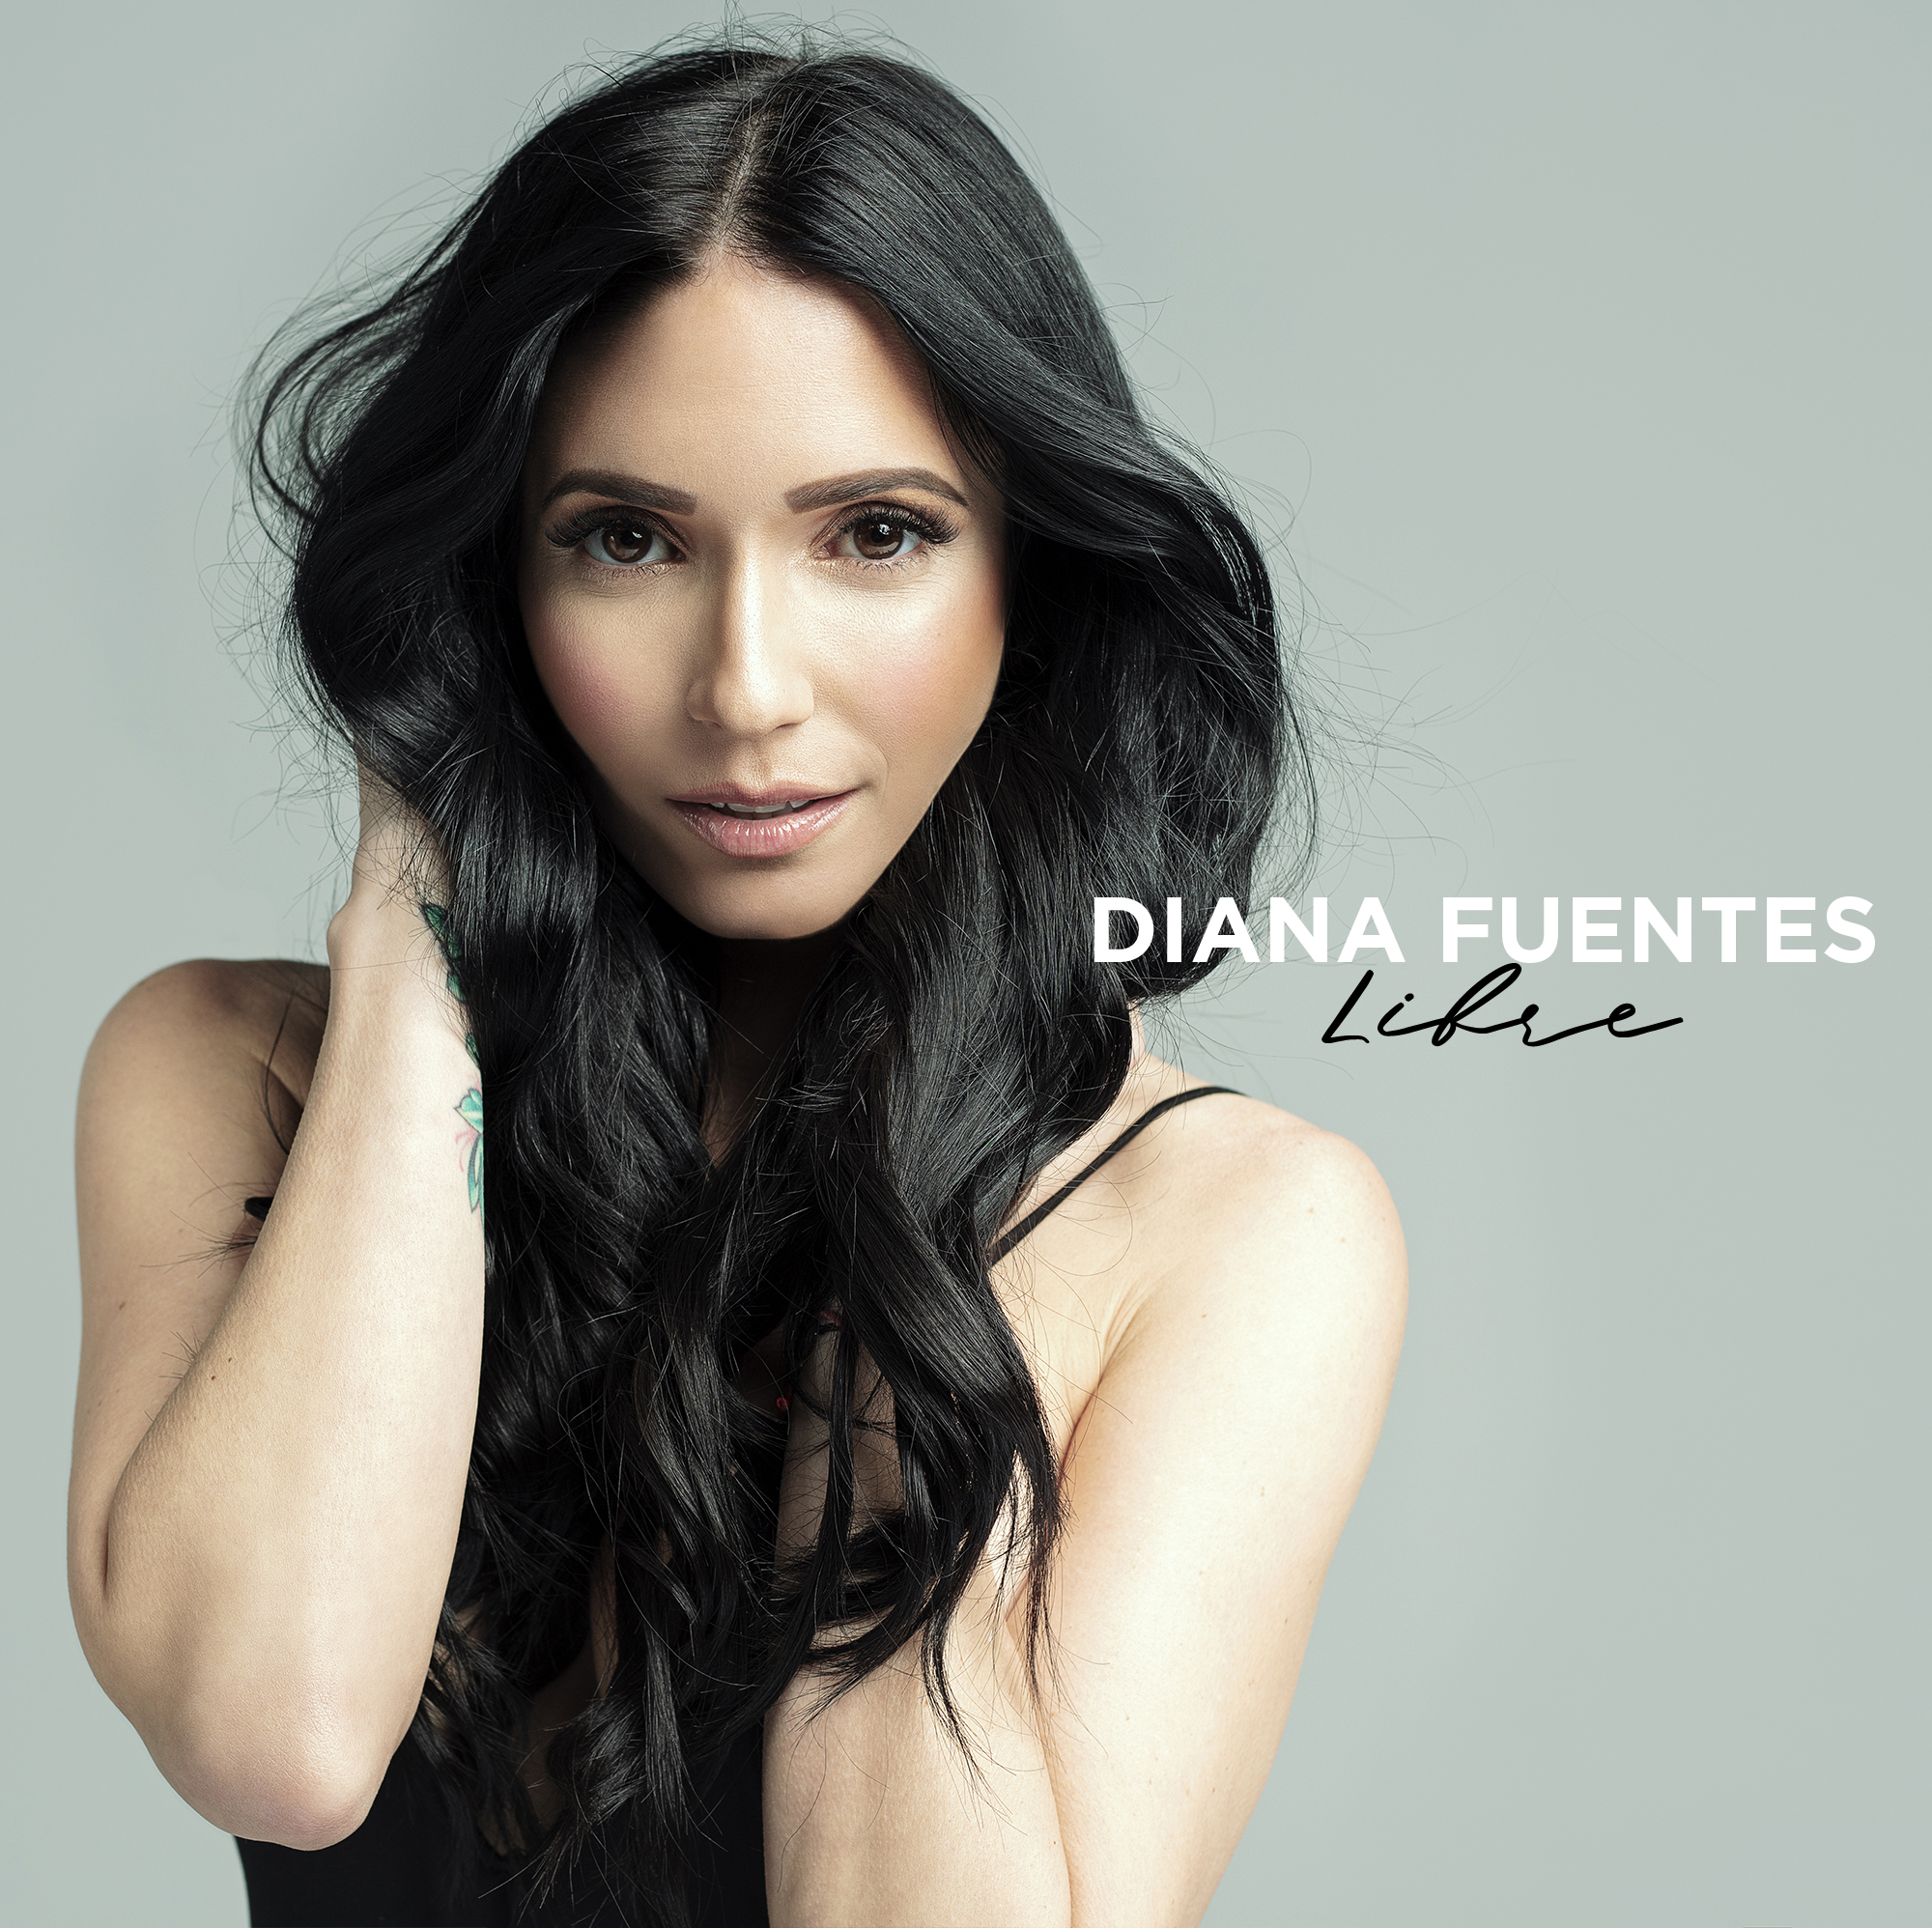 DianaFuentes_Libre